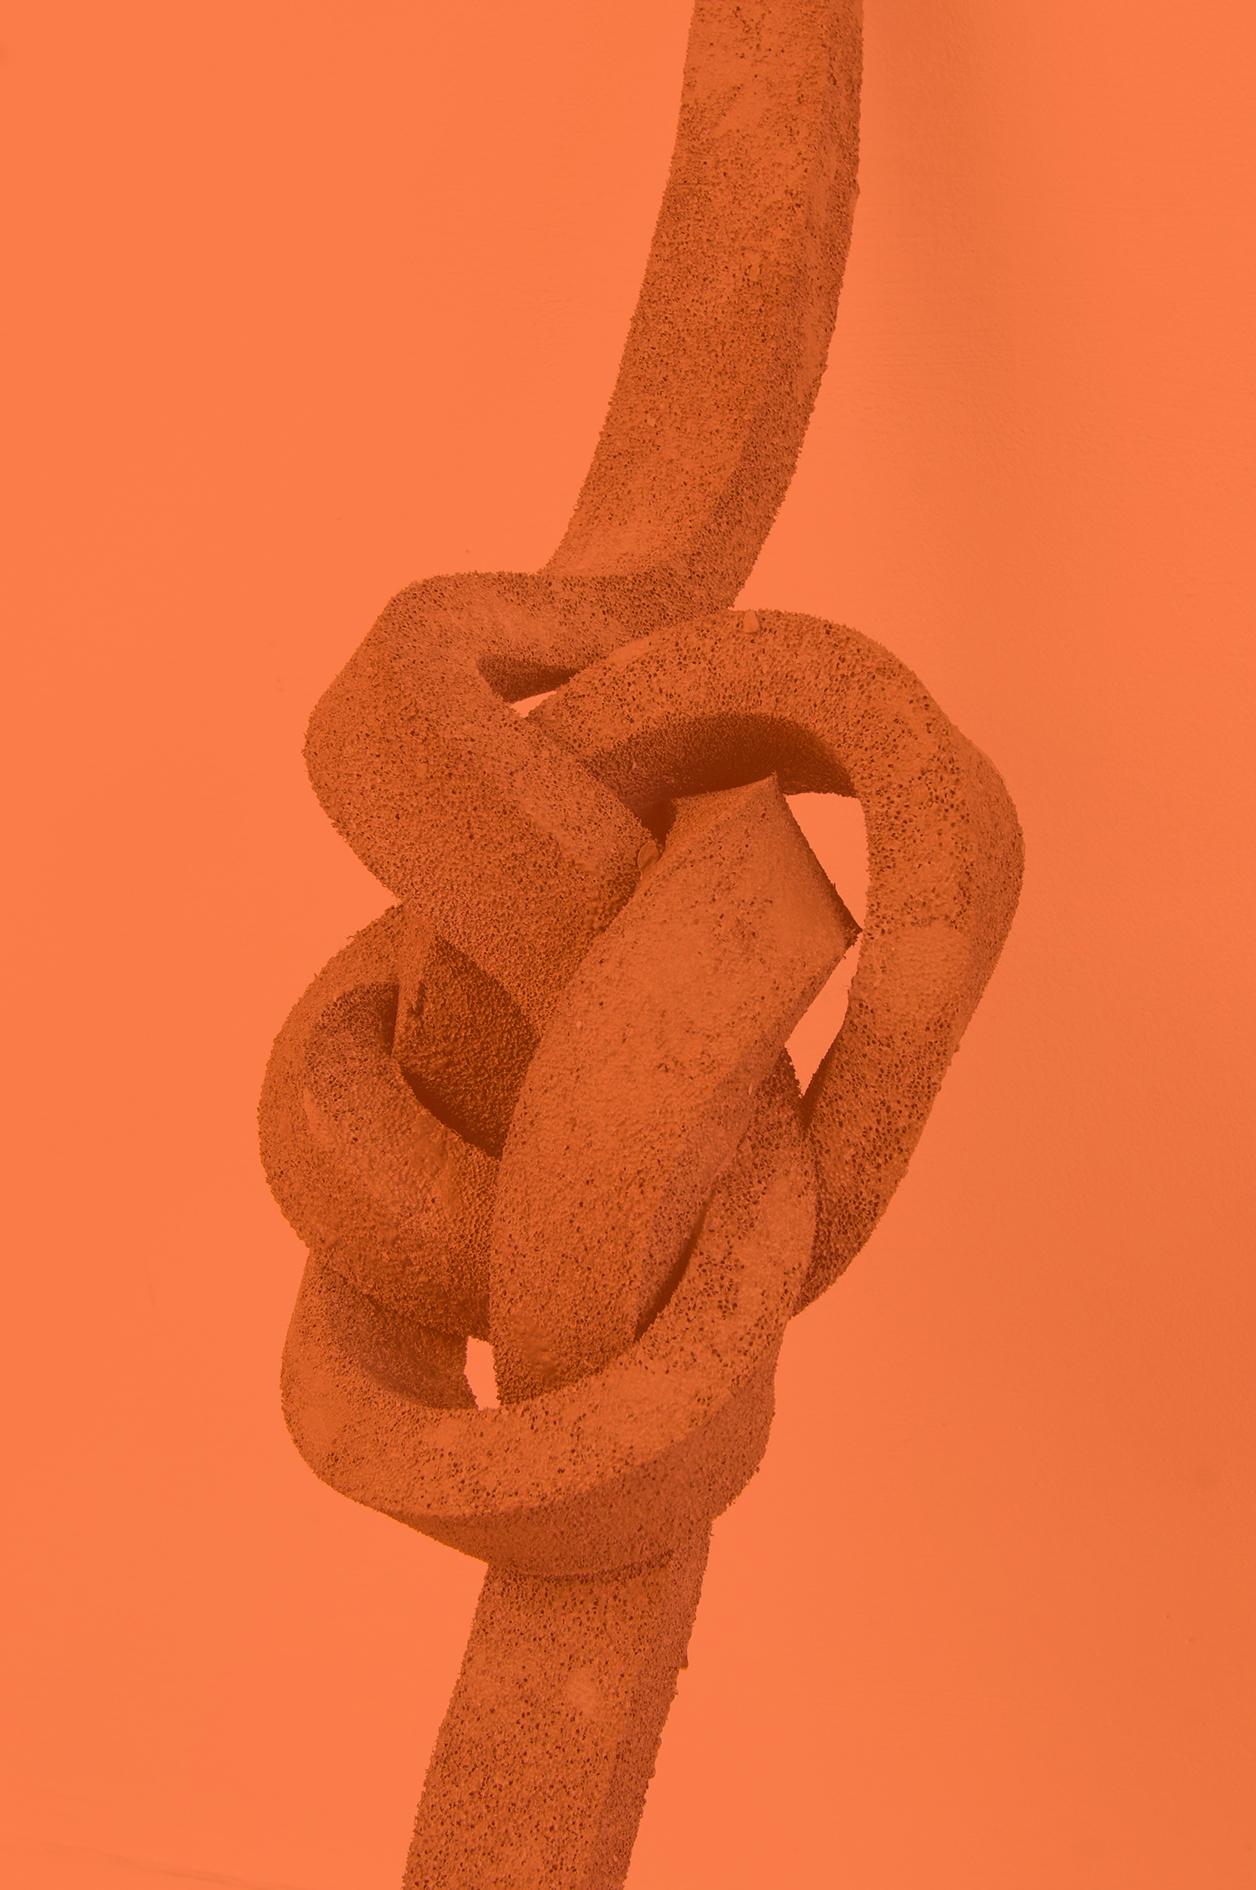 Knot with Colour Overlay ORANGE.jpg